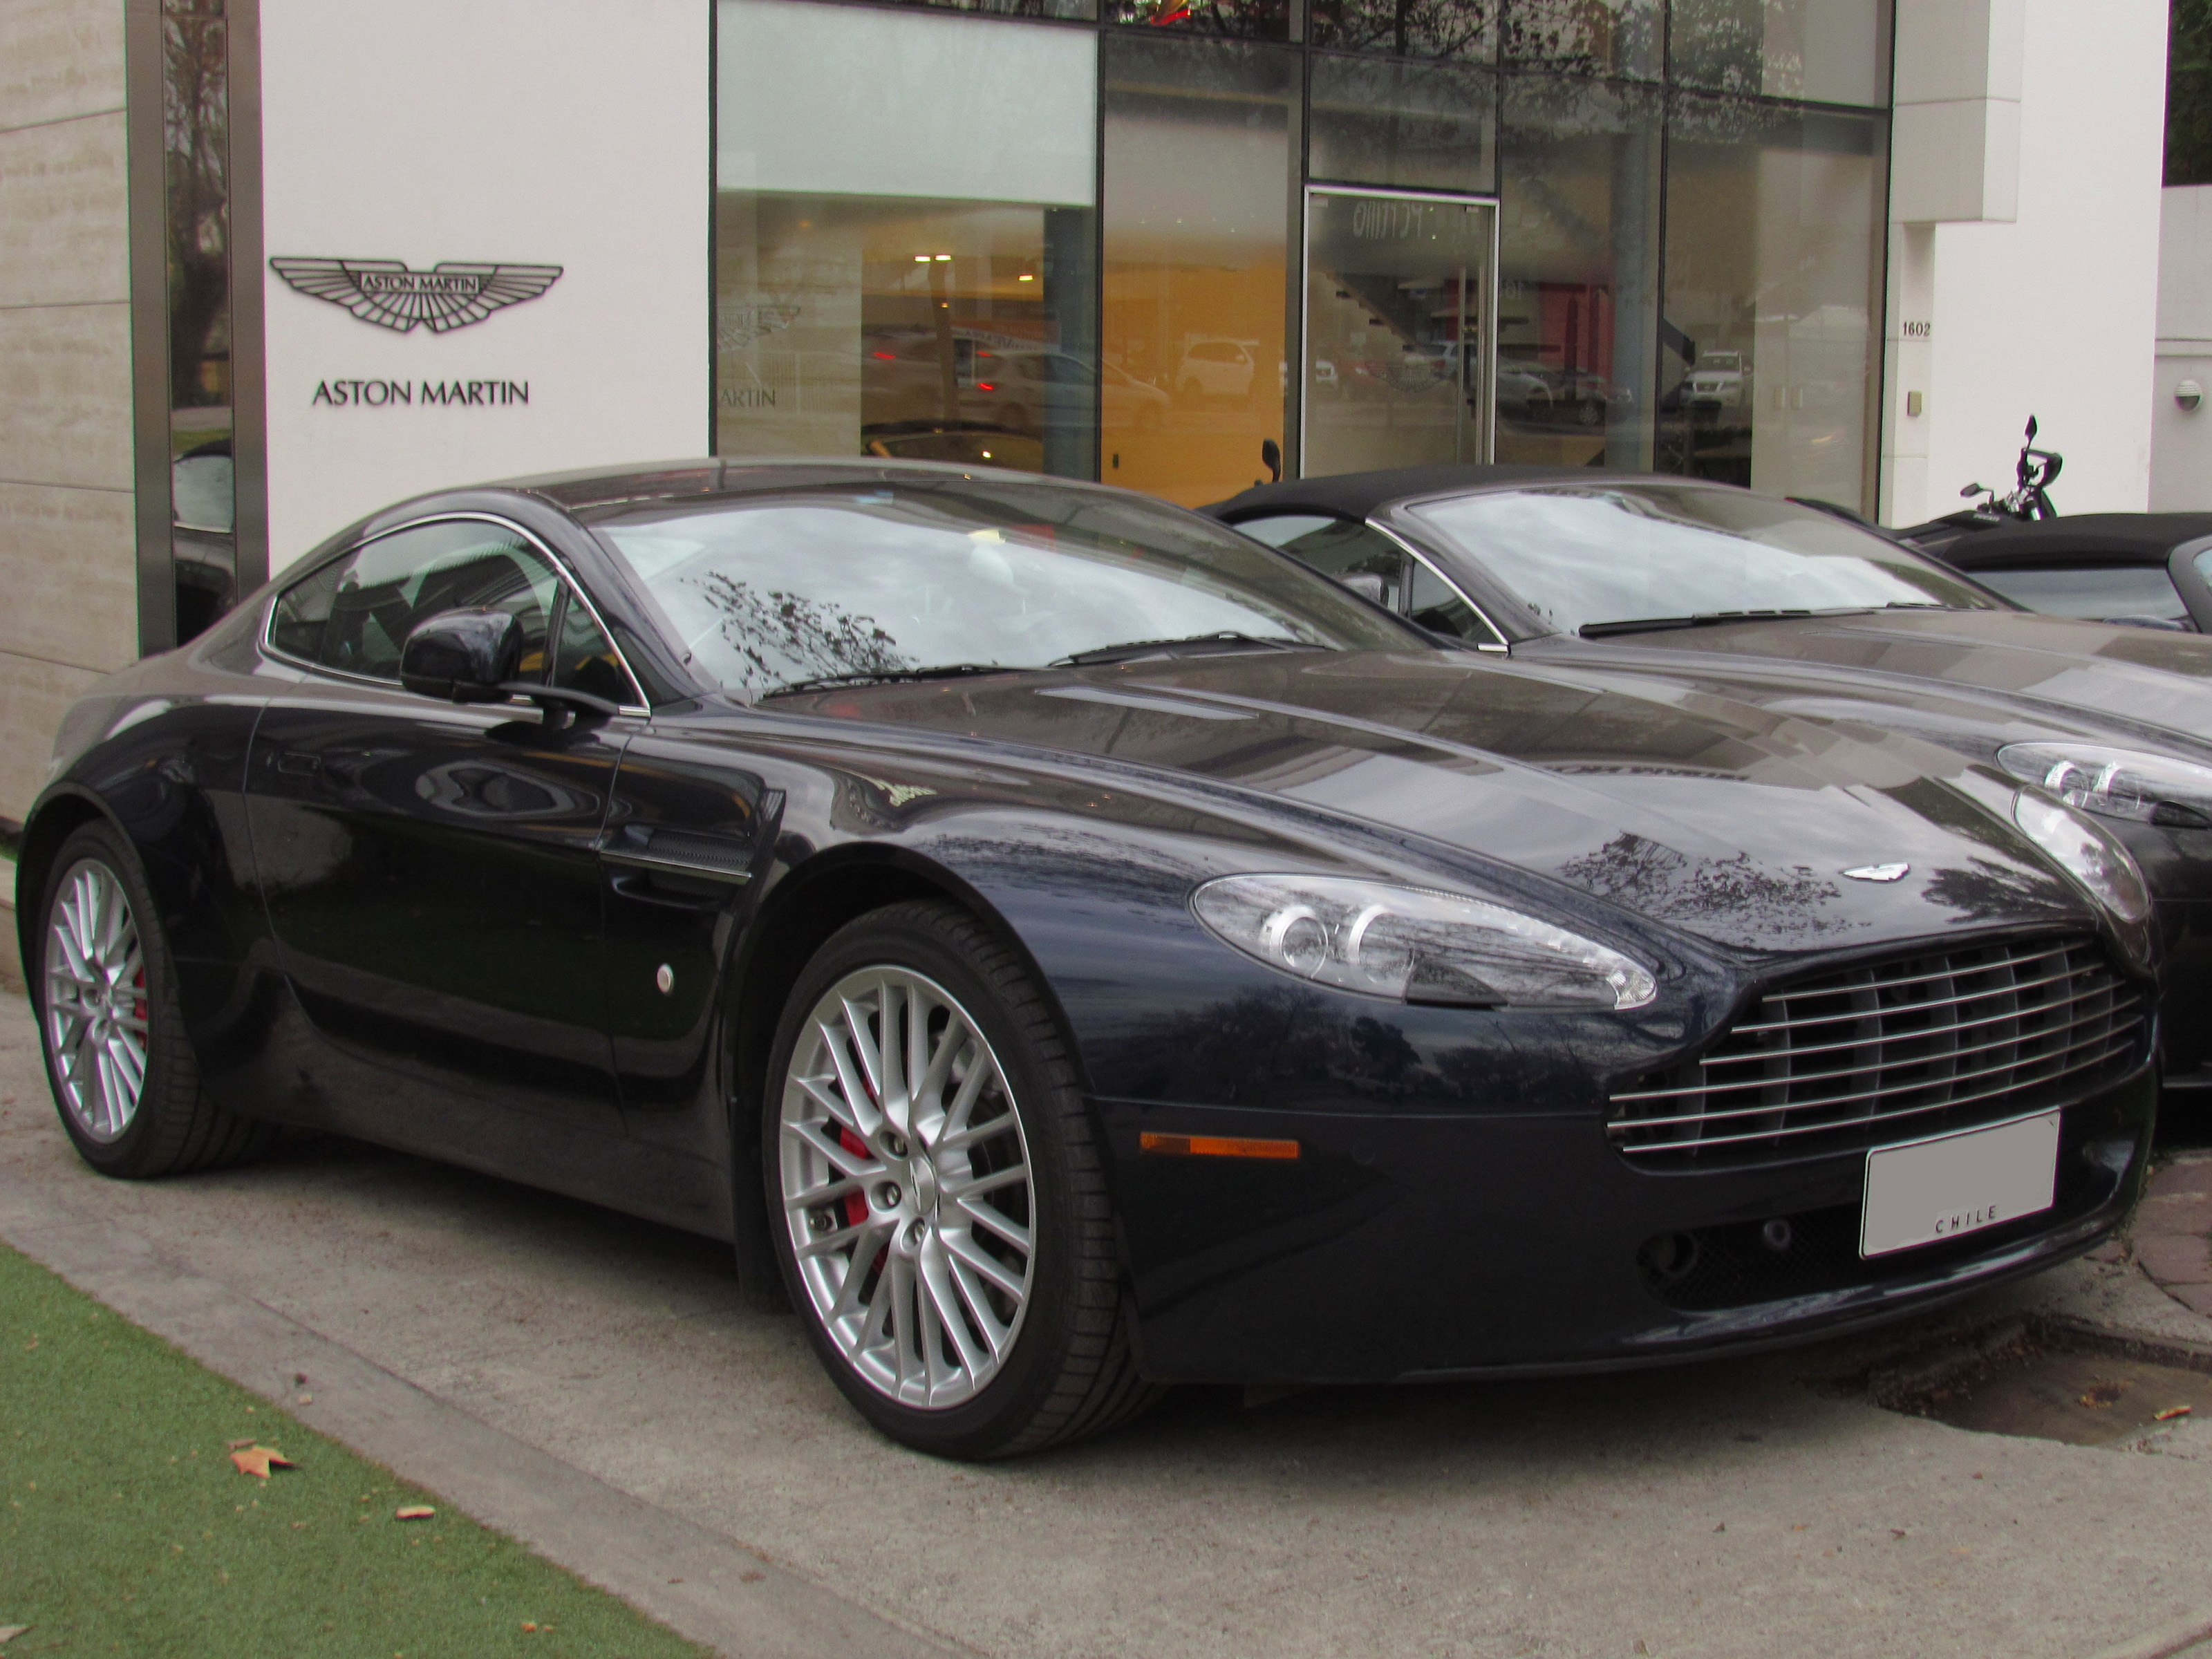 File Aston Martin V8 Vantage 2011 14974896525 Jpg Wikimedia Commons